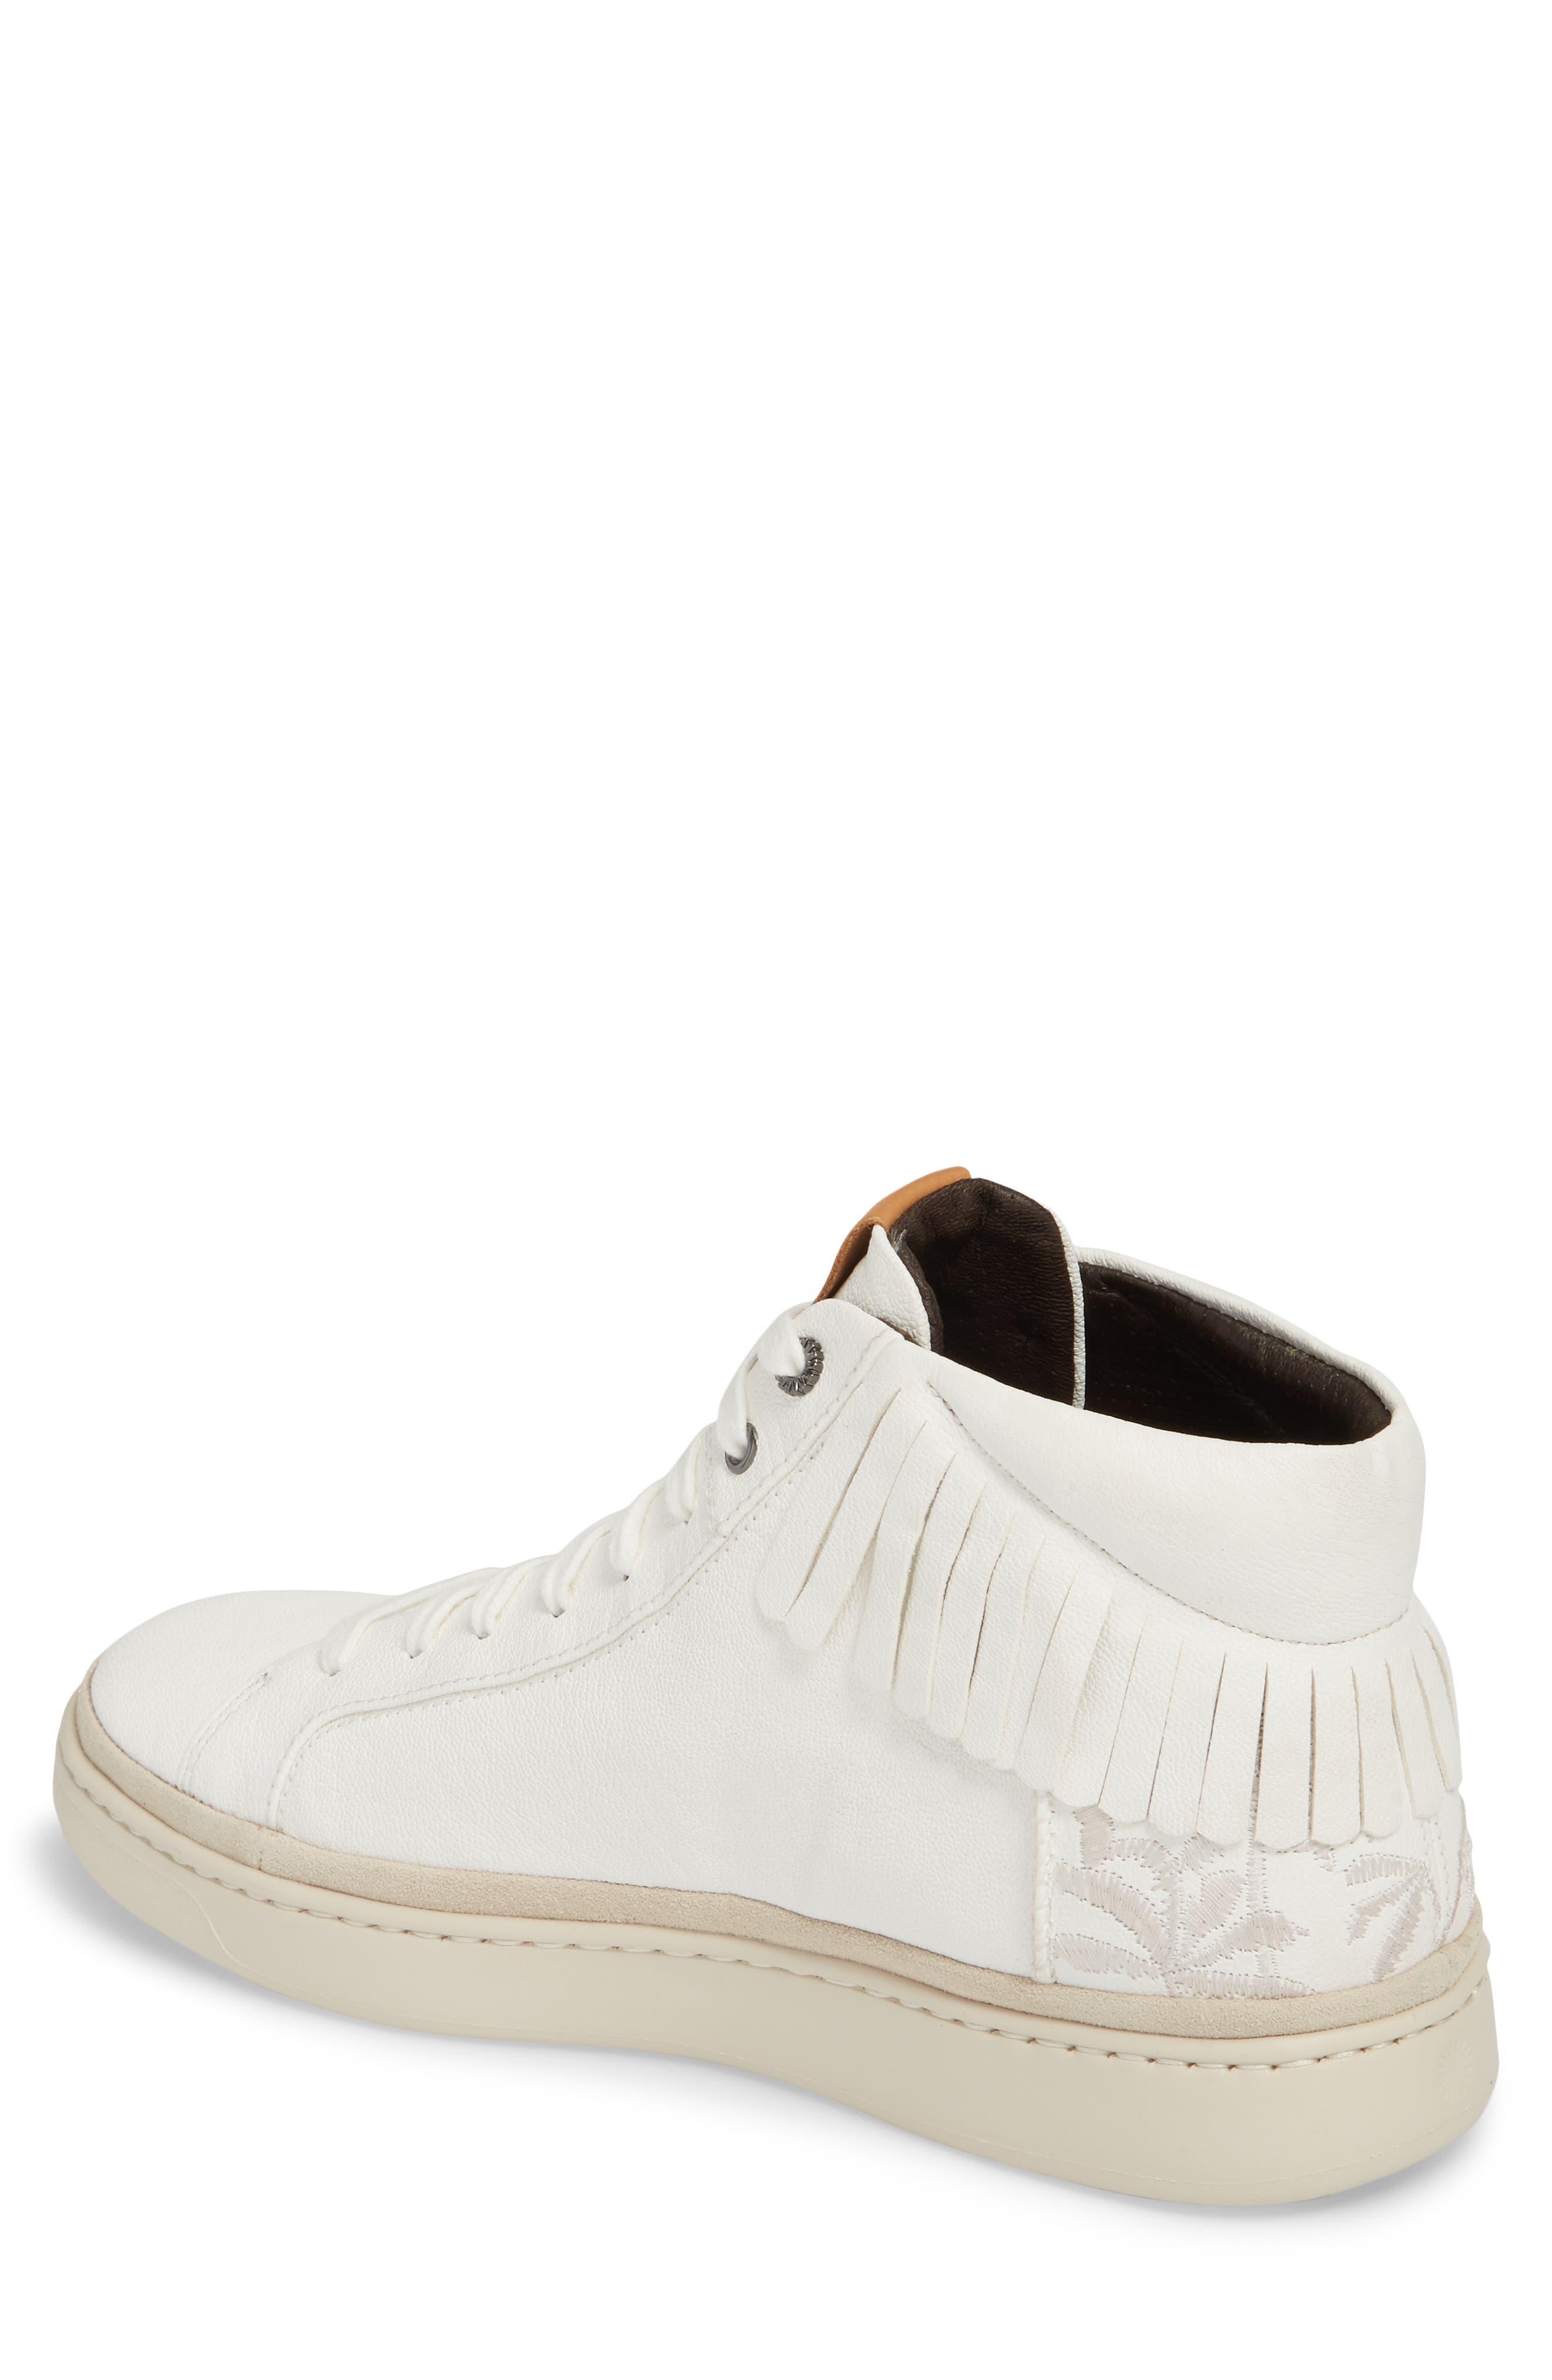 Cali Fringe High Top Sneaker,                             Alternate thumbnail 2, color,                             White Leather